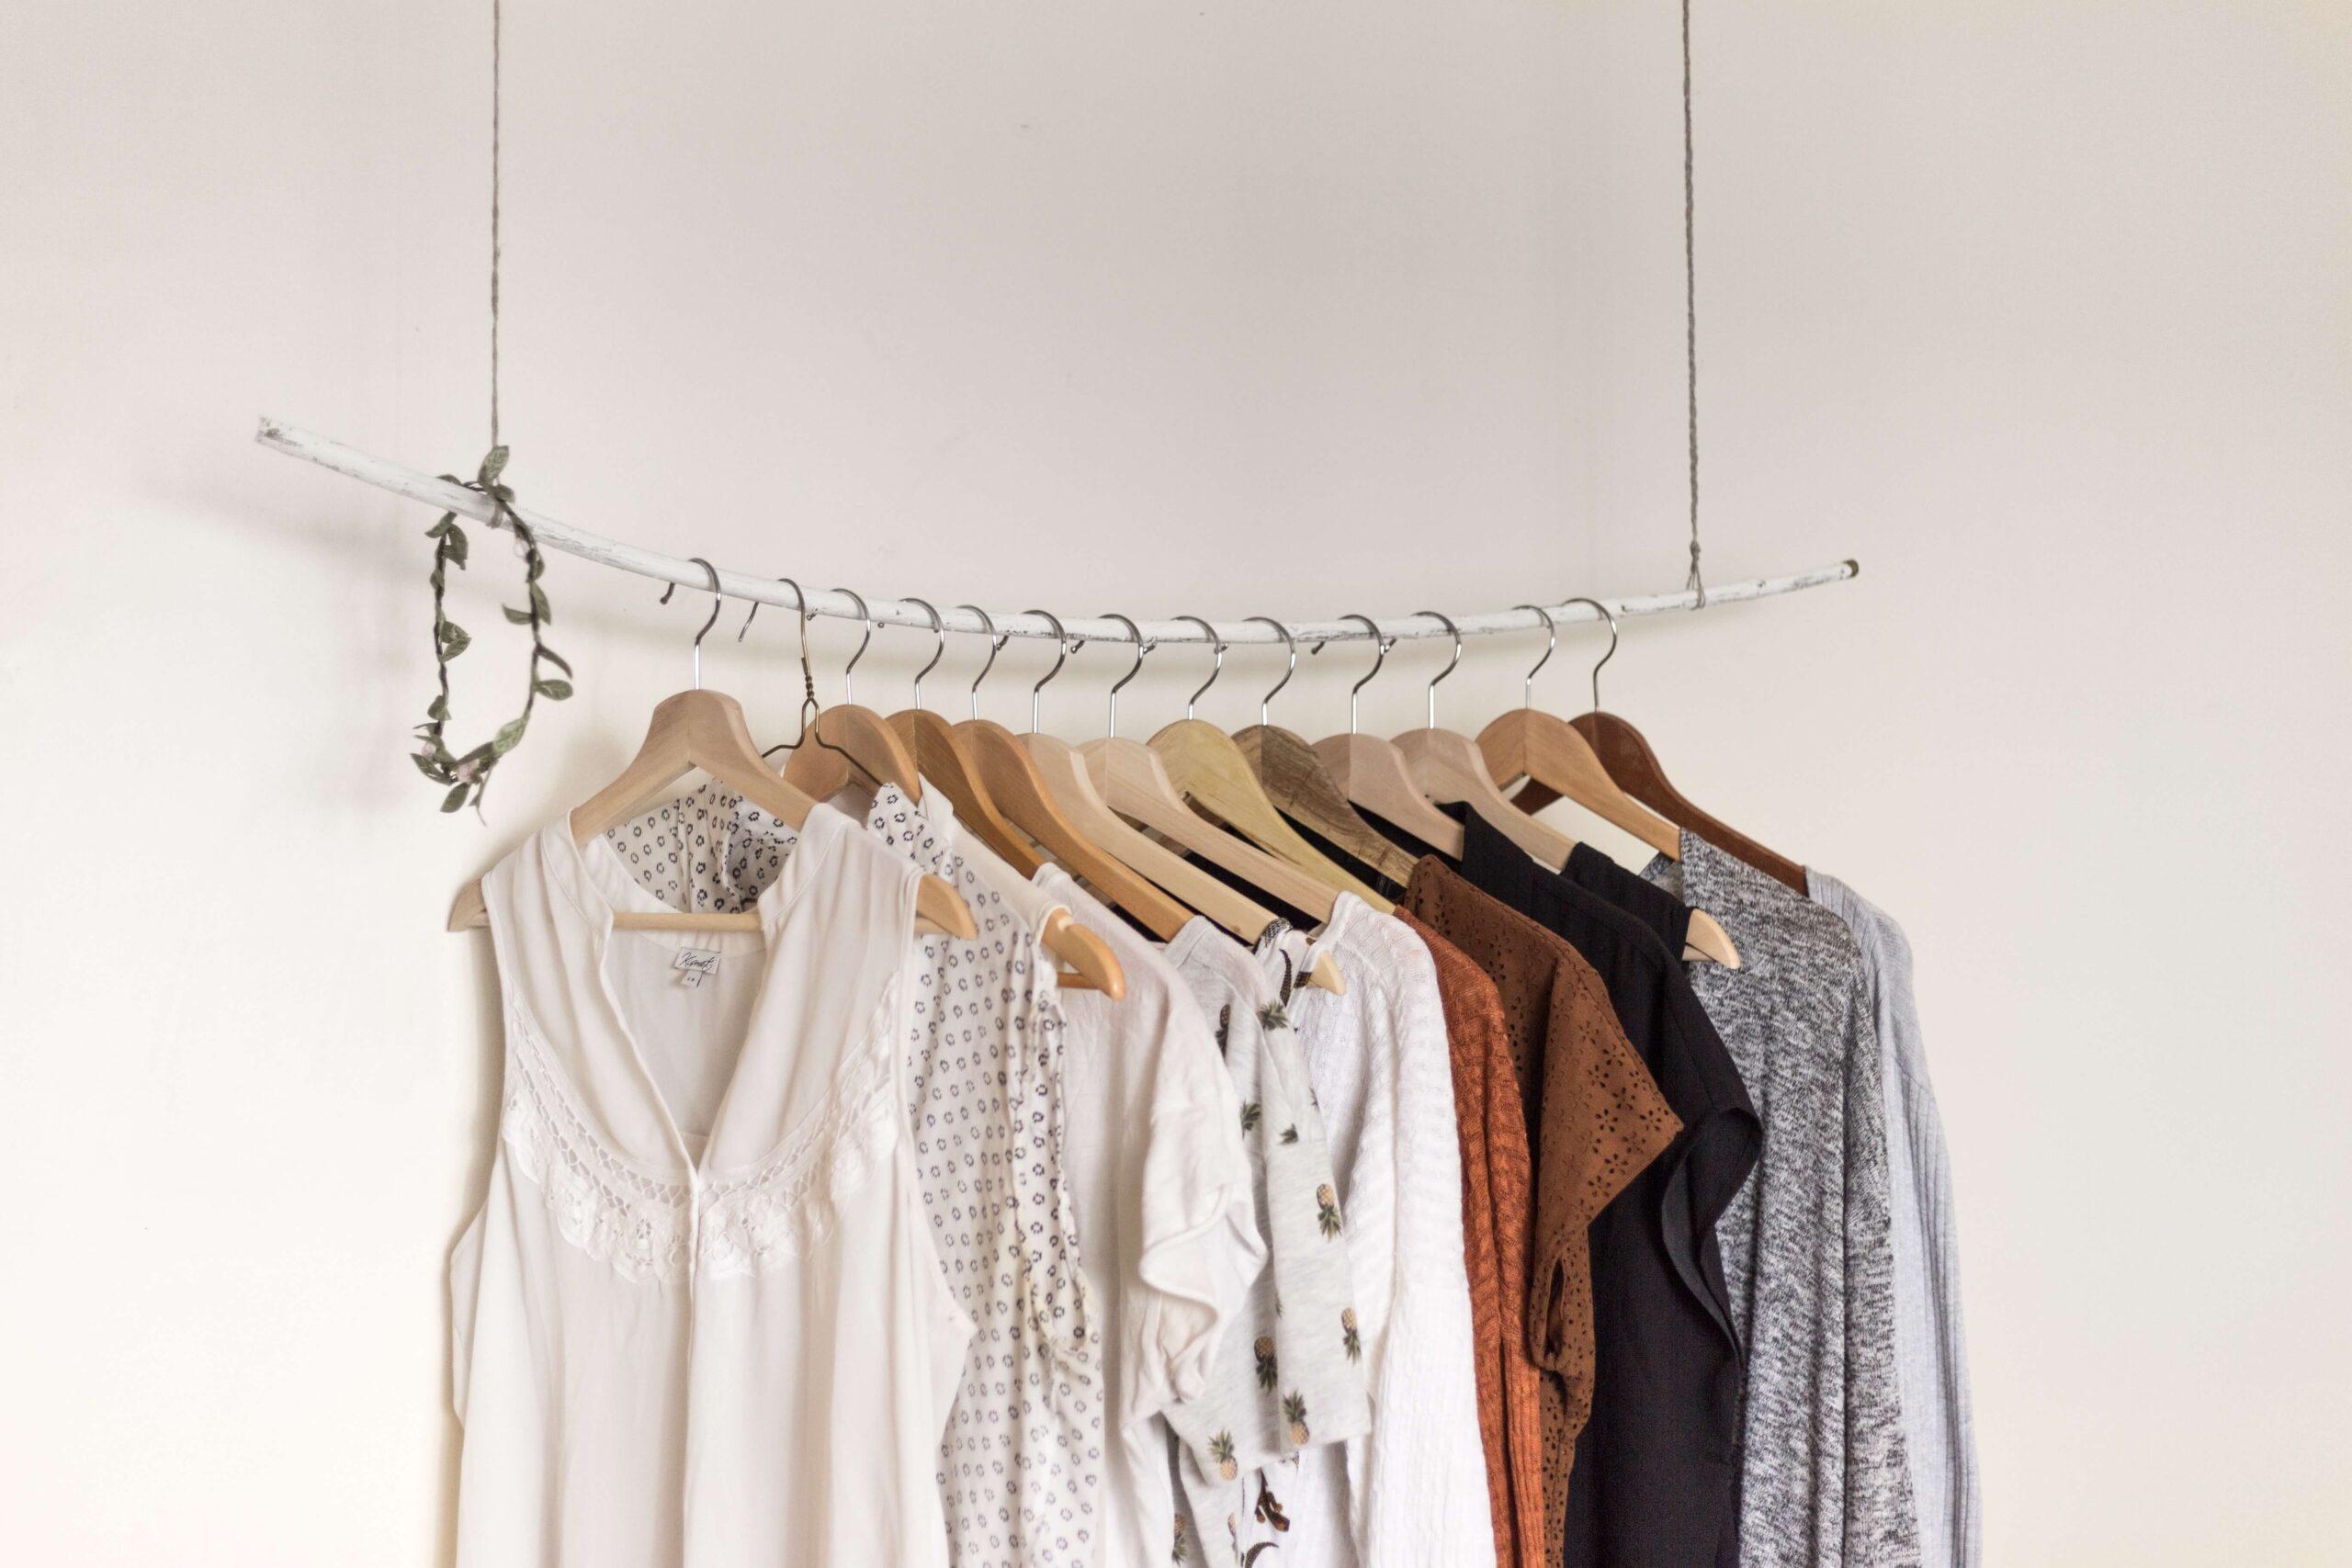 second hand clothes, reuse, recycle, zero waste, Nina Franck, Nobantu Modise